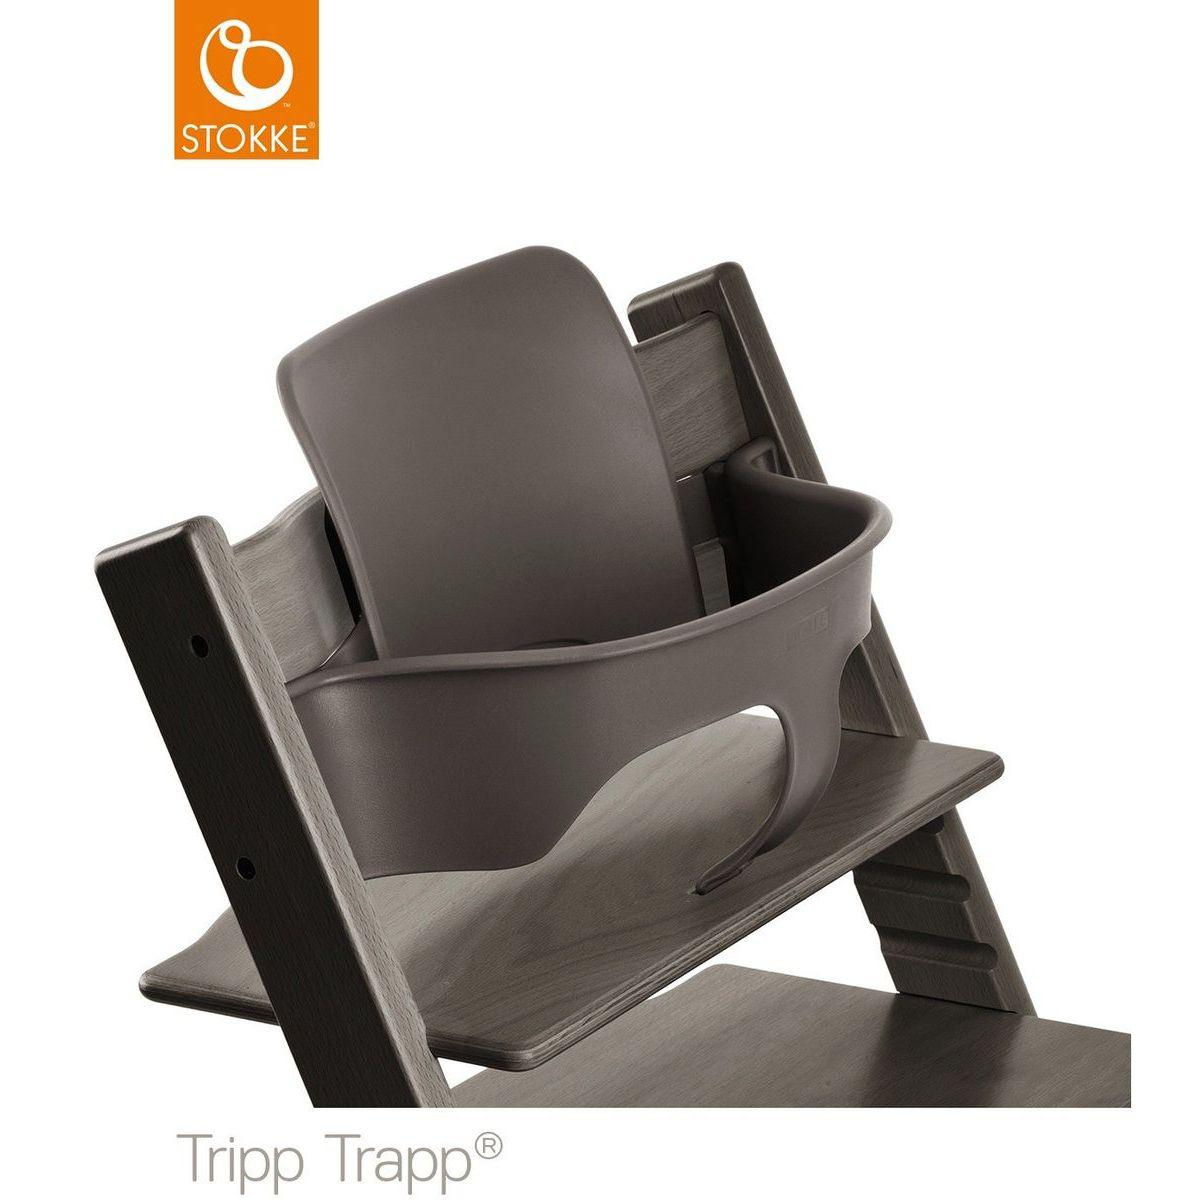 Baby set trona bebé TRIPP TRAPP Stokke gris bruma